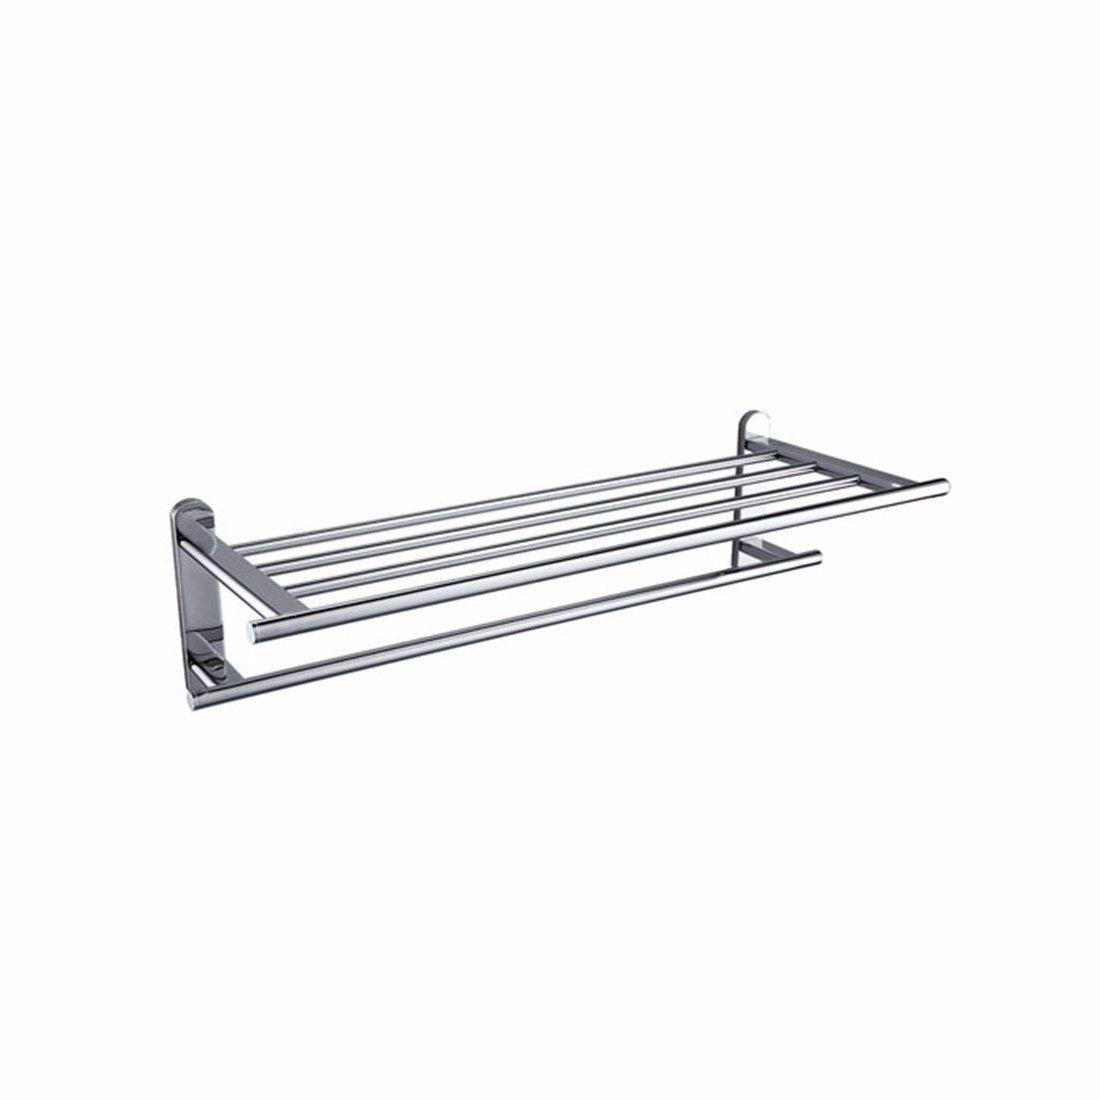 LAONA Contemporary chrome plated oval base copper stainless steel bathroom pendant, towel bar, toilet brush rack,Towel rack